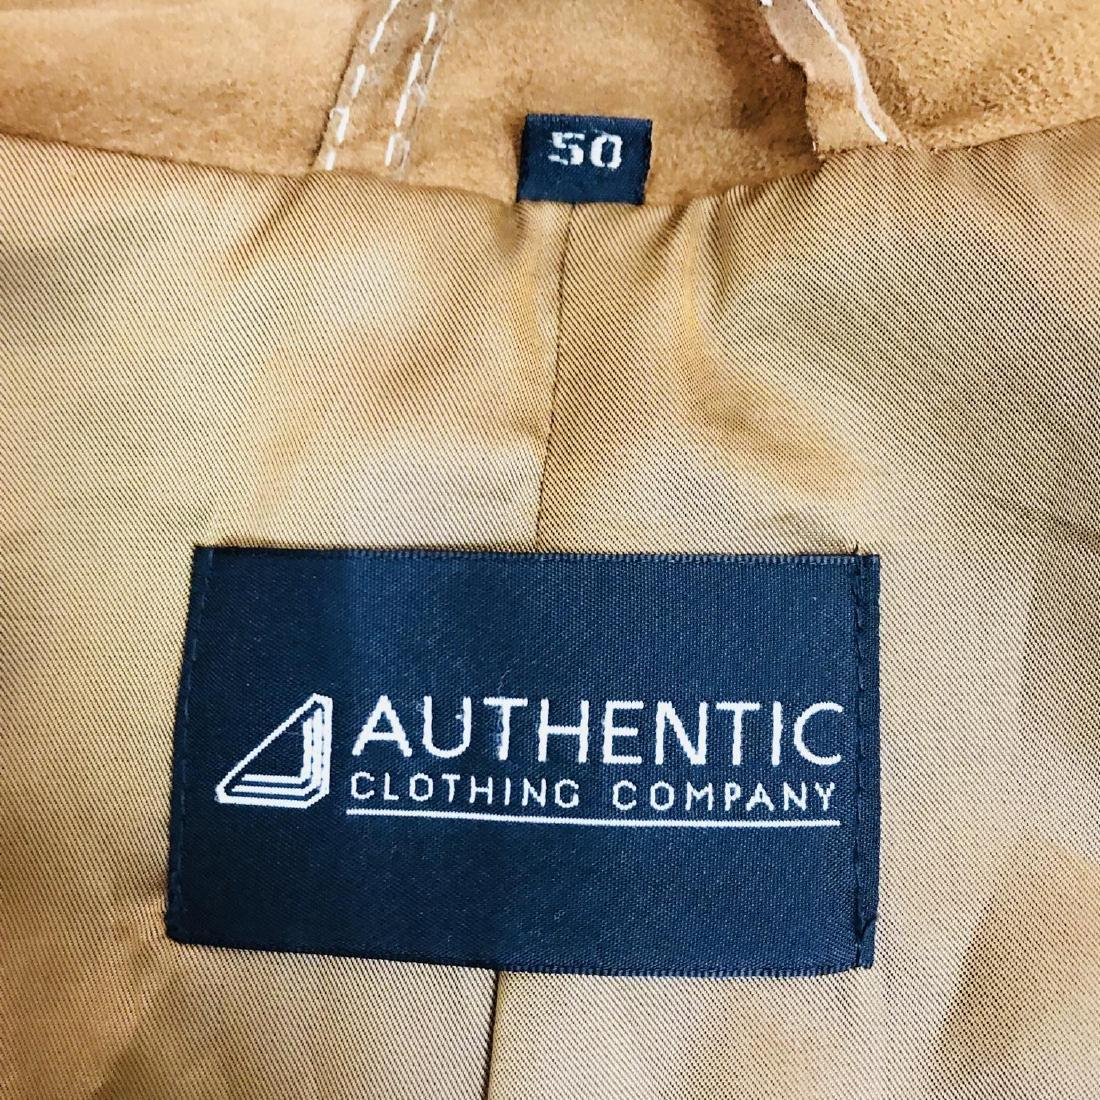 Vintage Men's Brown Suede Leather Jacket Coat Size 40 - 7